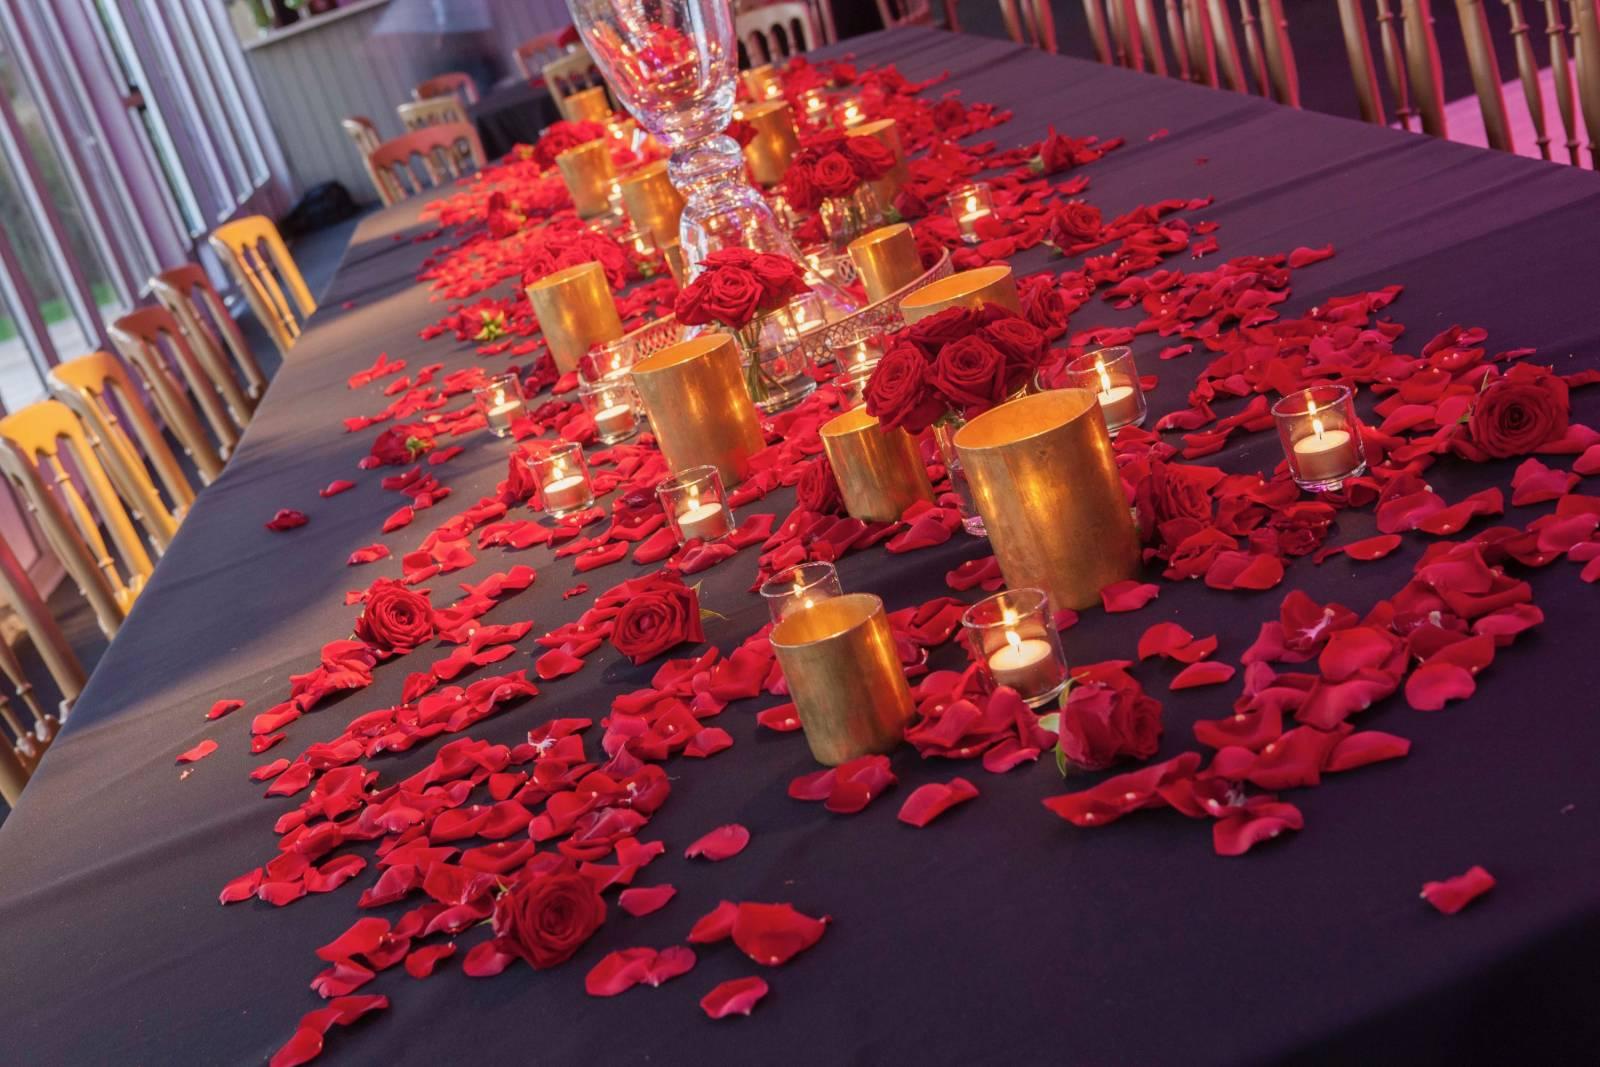 Carpe Diem Bloemen & Decoratie - House of Weddings  - 53